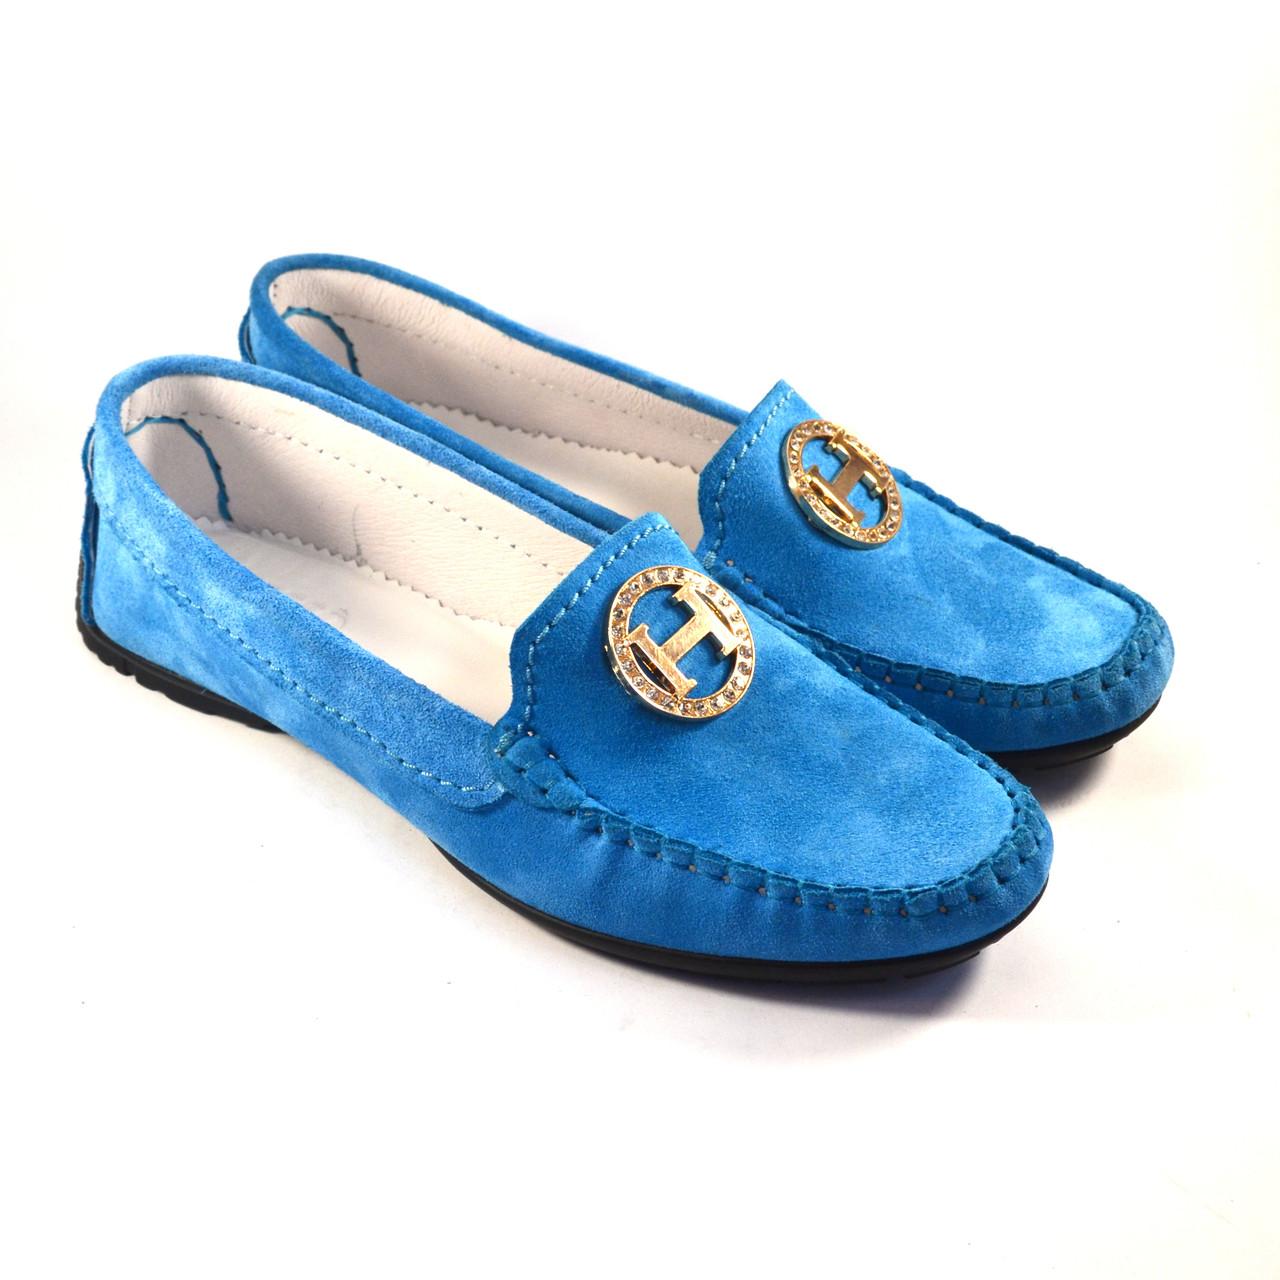 "Мокасини жіночі замшеві Ornella Blu Sky Vel by Rosso Avangard колір блакитний ""Небо"""